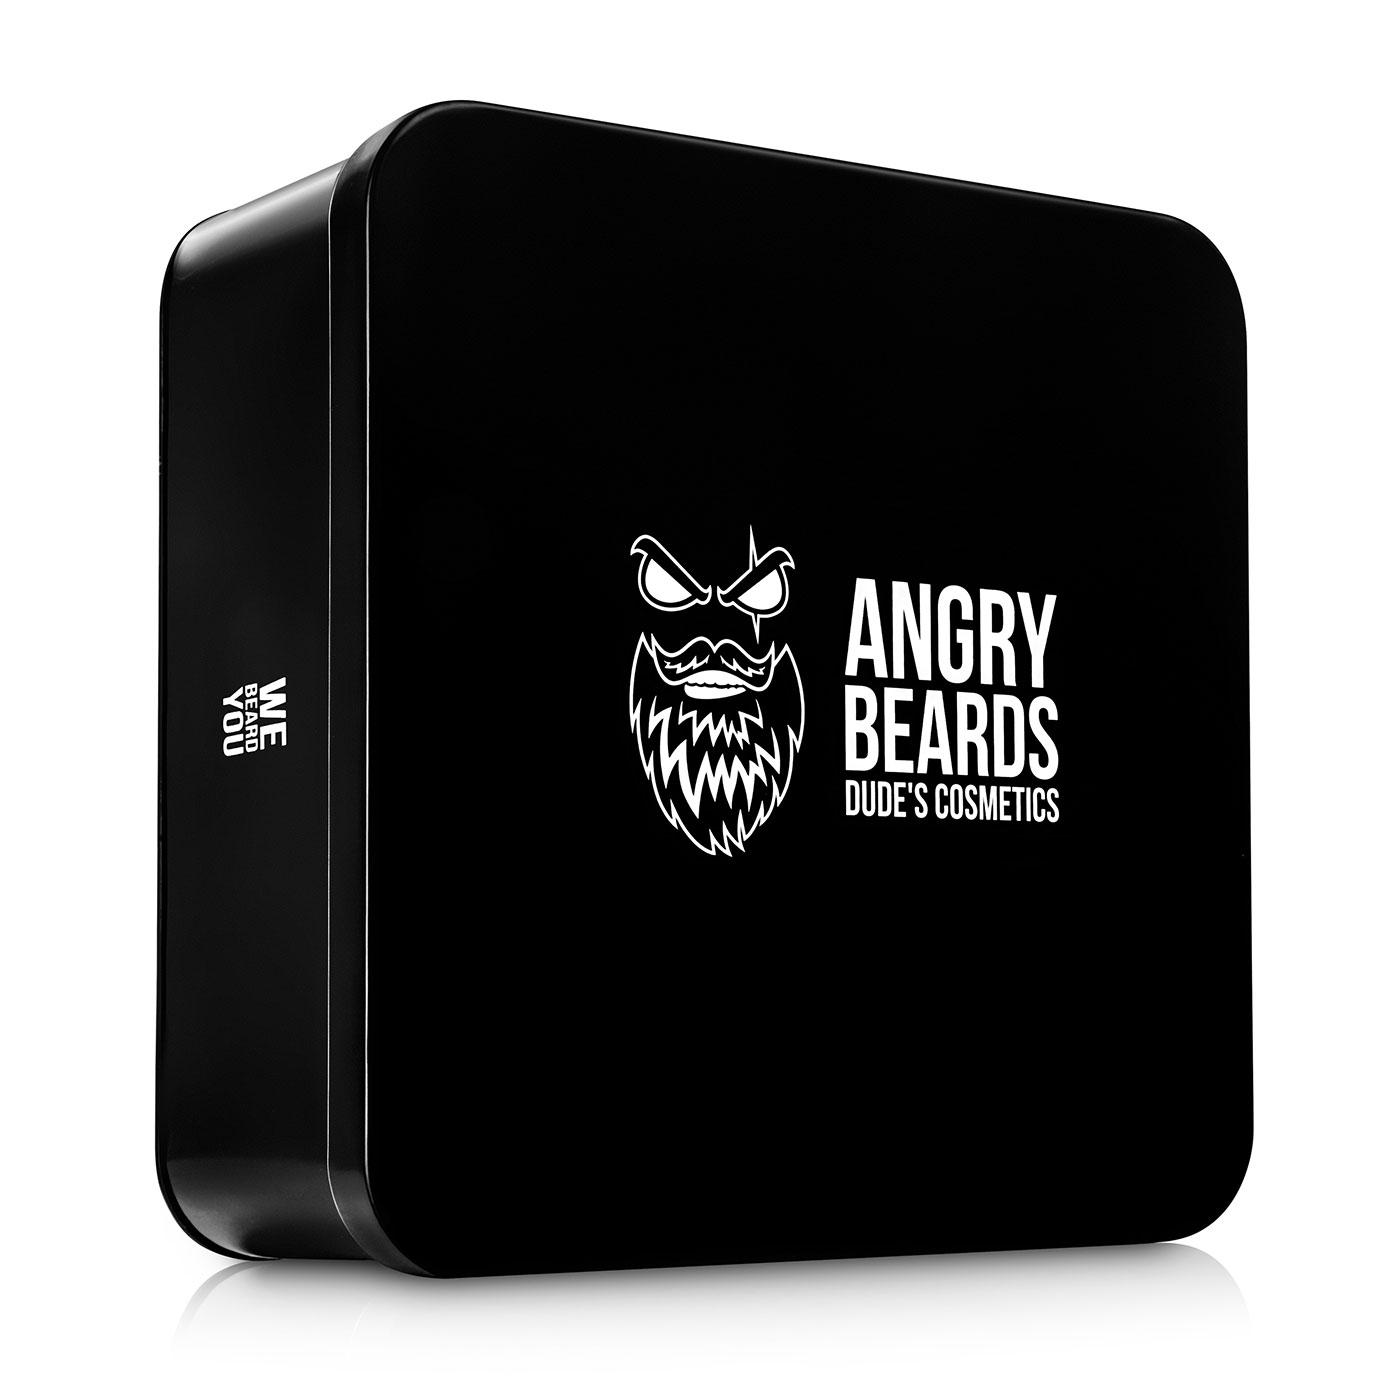 angry-beards-gift-box-1400px